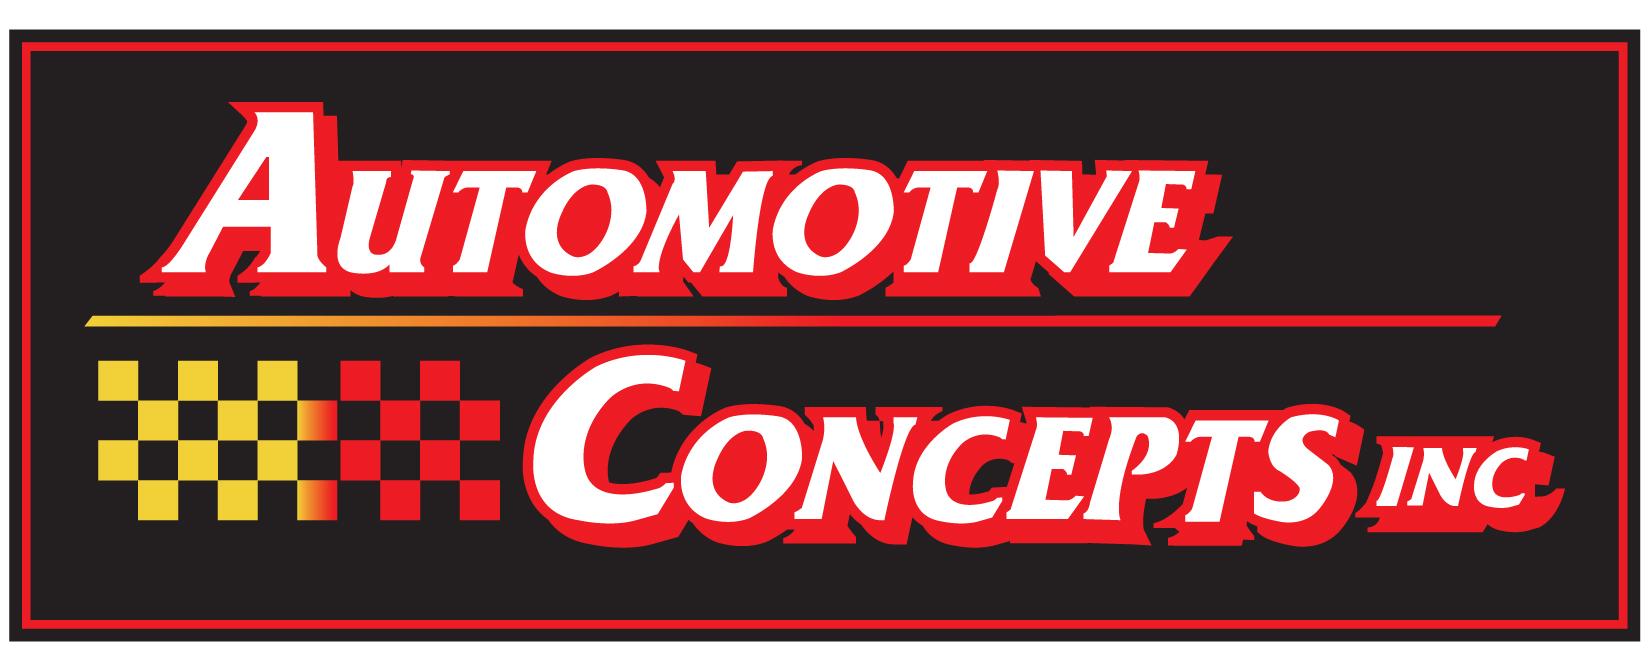 AutomotiveConcepts.jpg